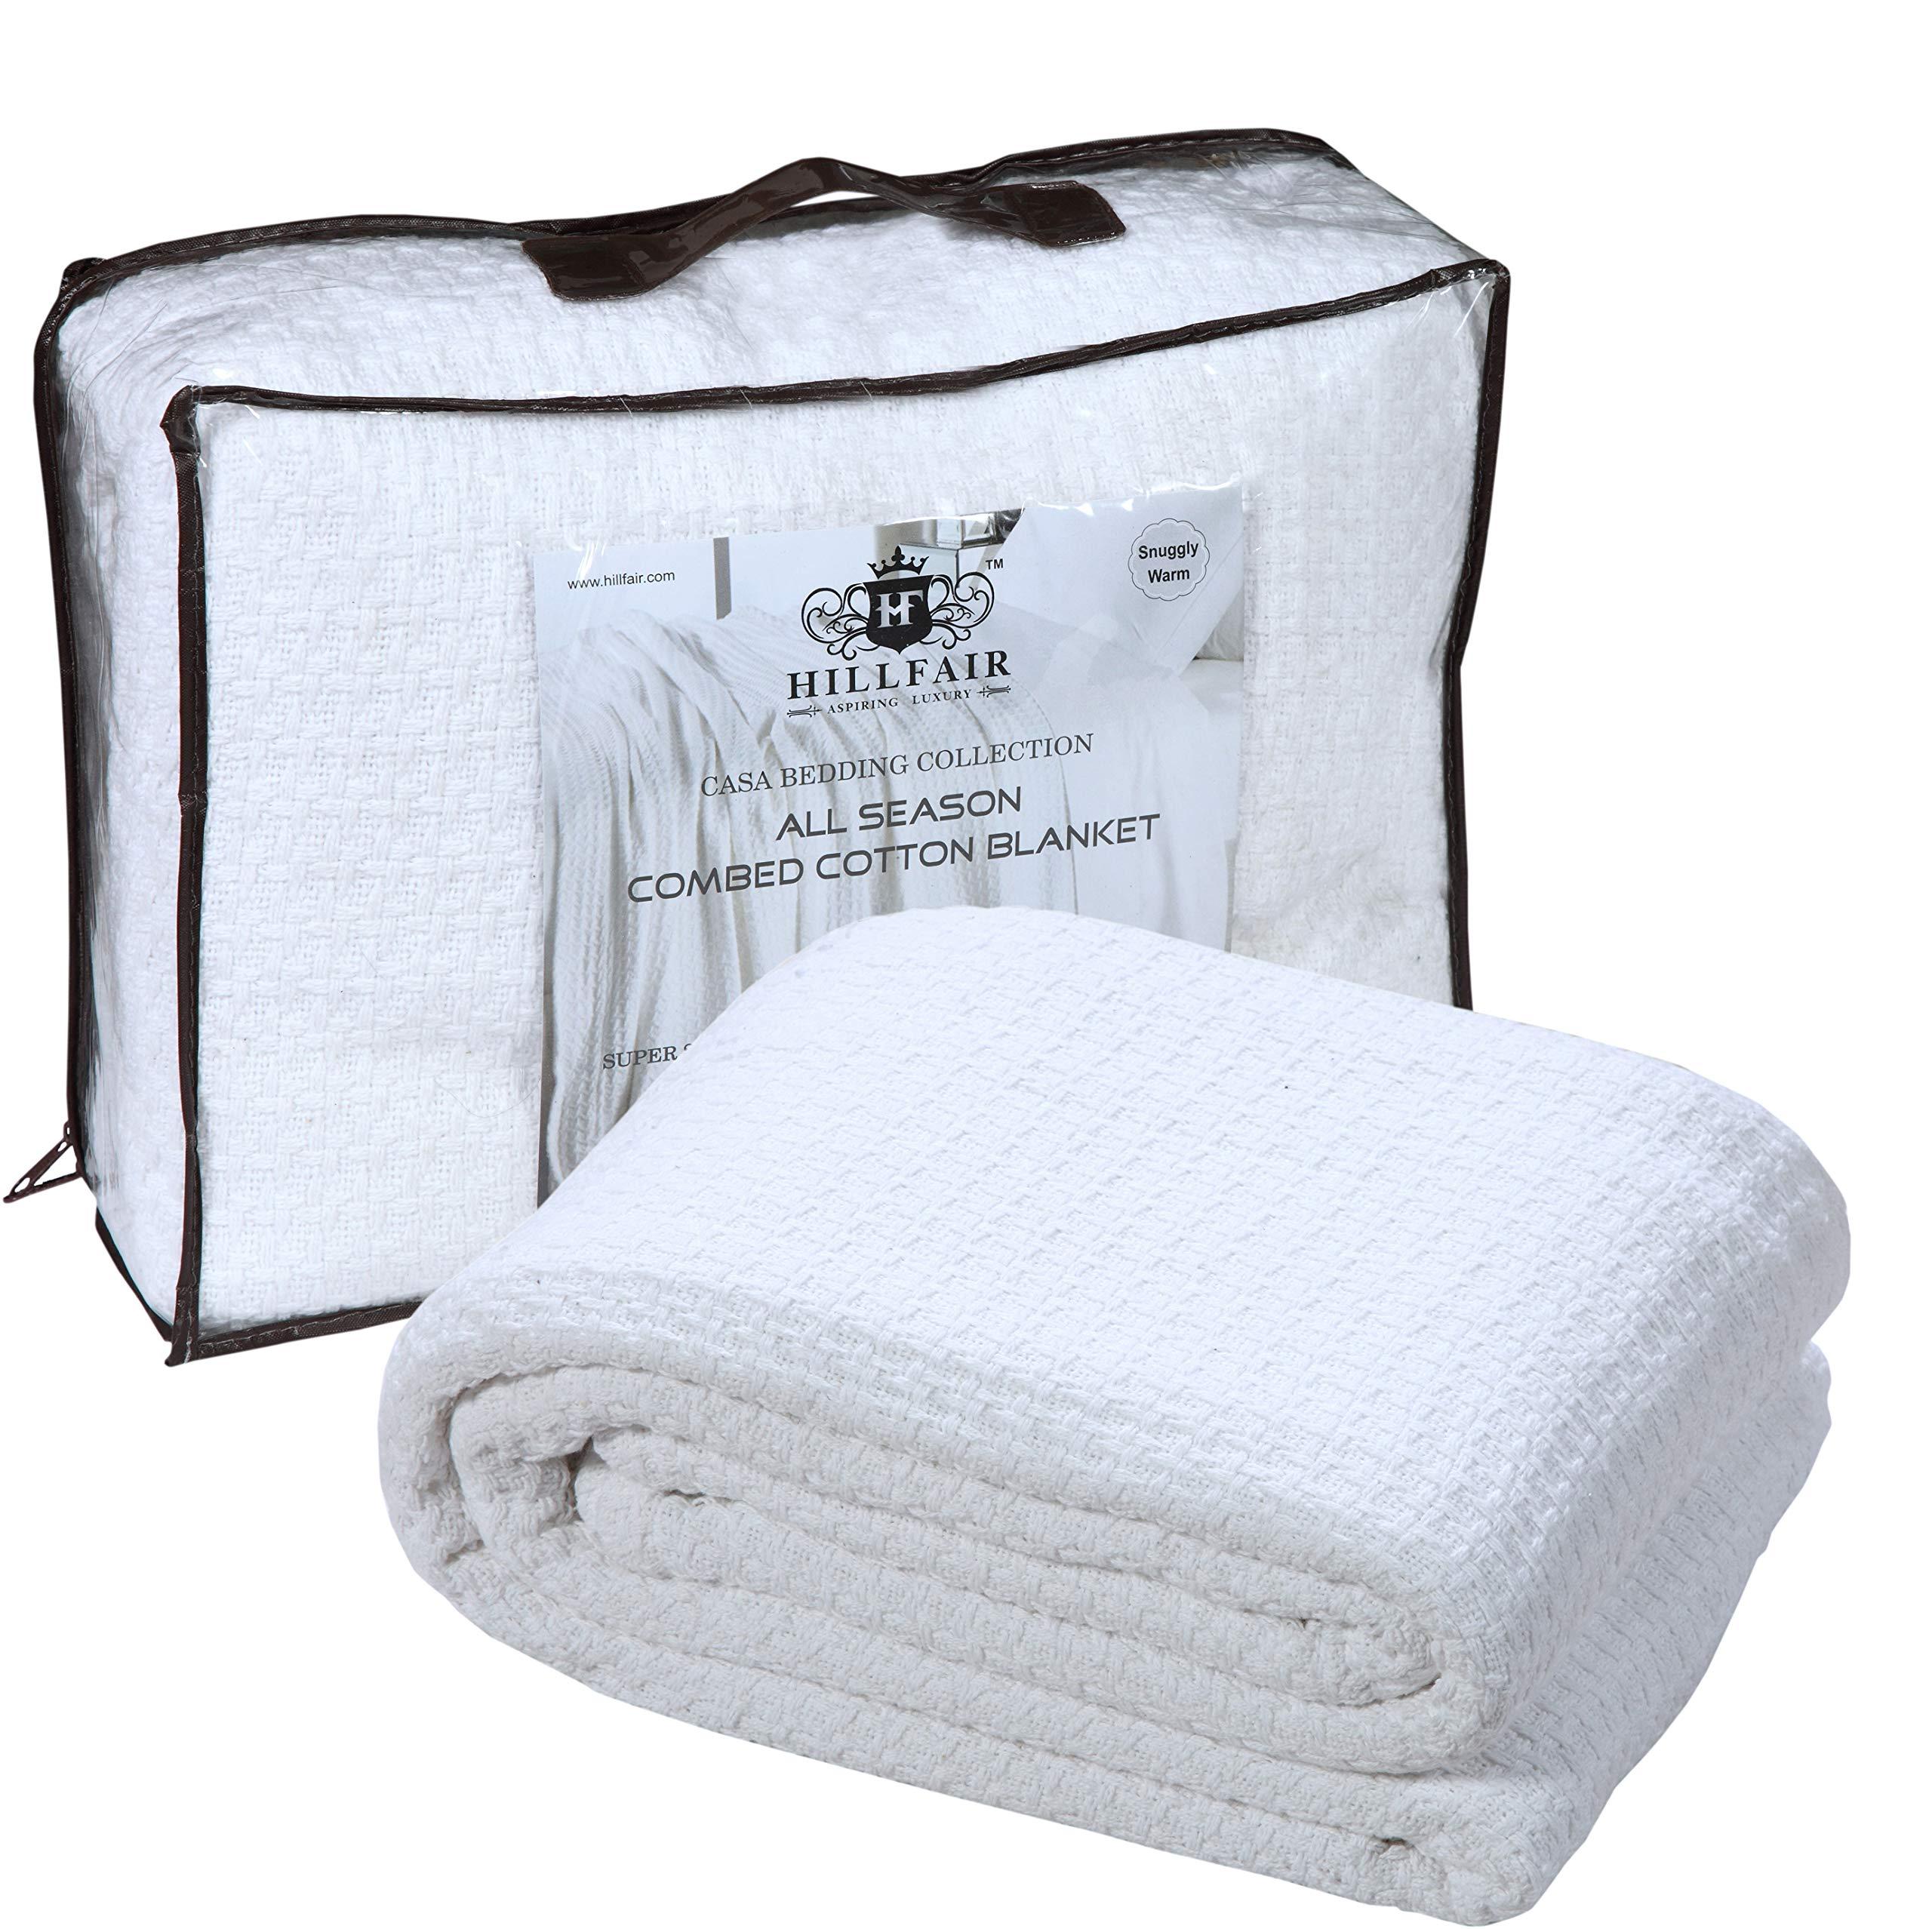 HILLFAIR 100% Soft Premium Combed Cotton Blanket- California King Blankets - Soft Warm Cotton Blanket-Extra Large California King Size Bed Blankets- All Season Cotton Blankets-White Cotton Blankets